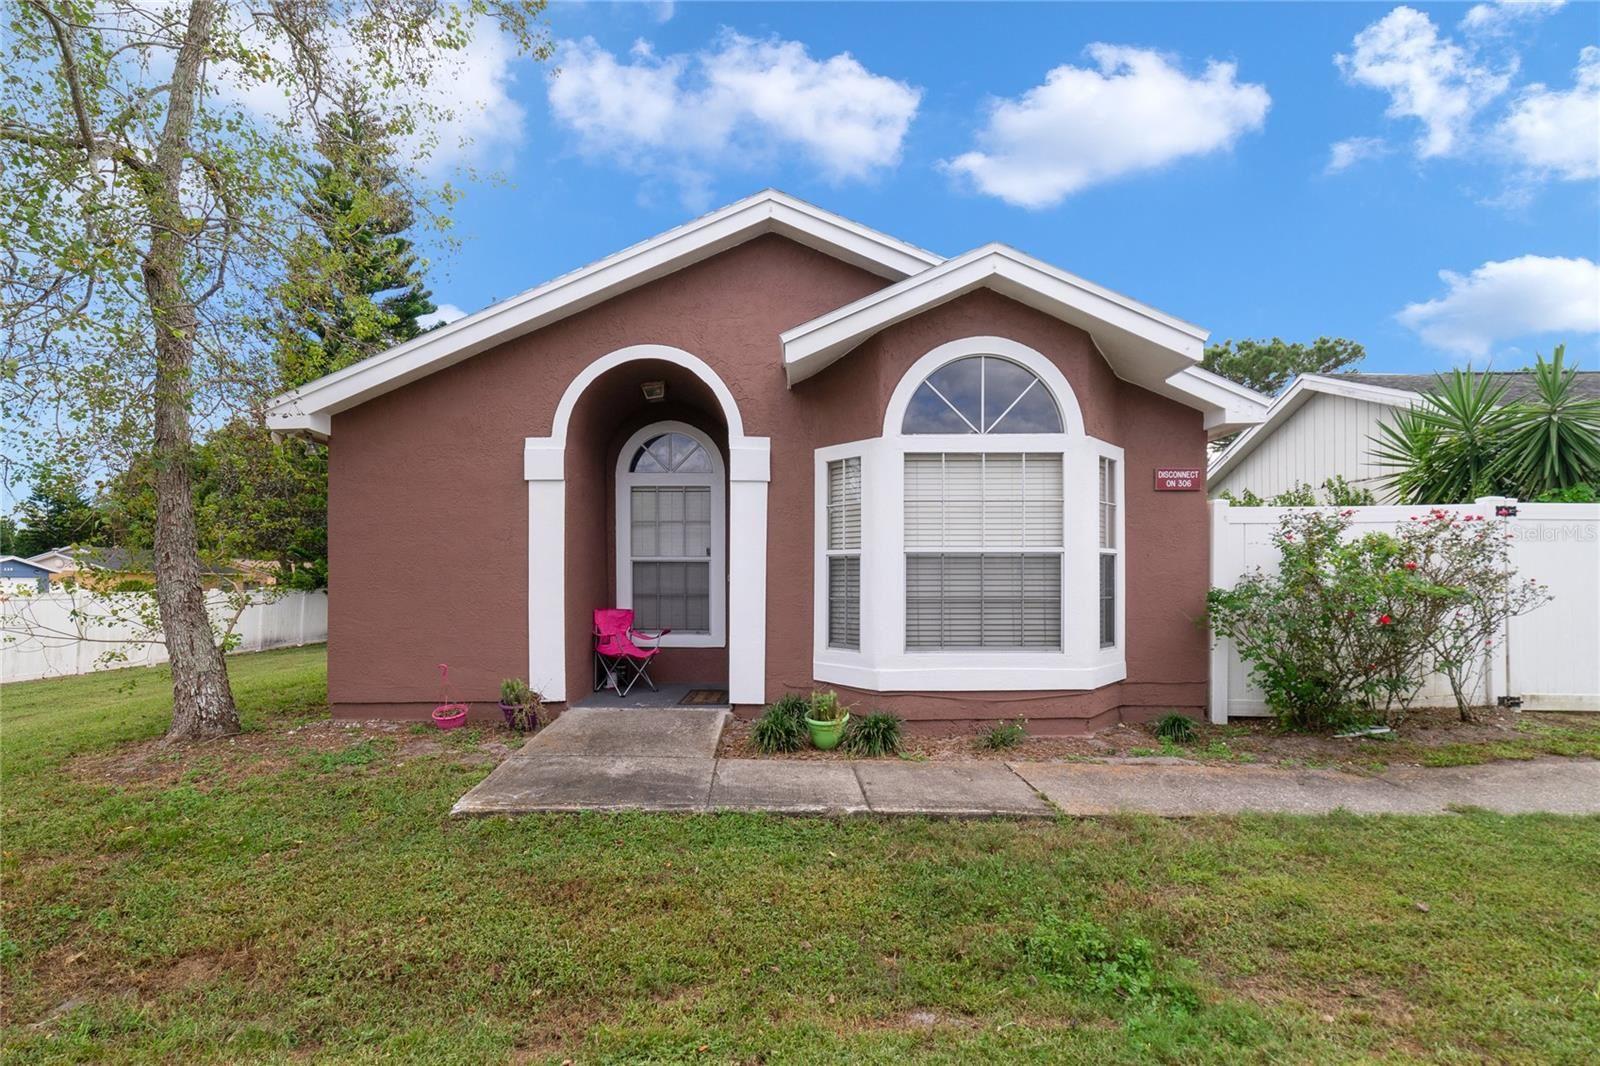 308 SAN GABRIEL STREET, Winter Springs, FL 32708 - #: O5977164